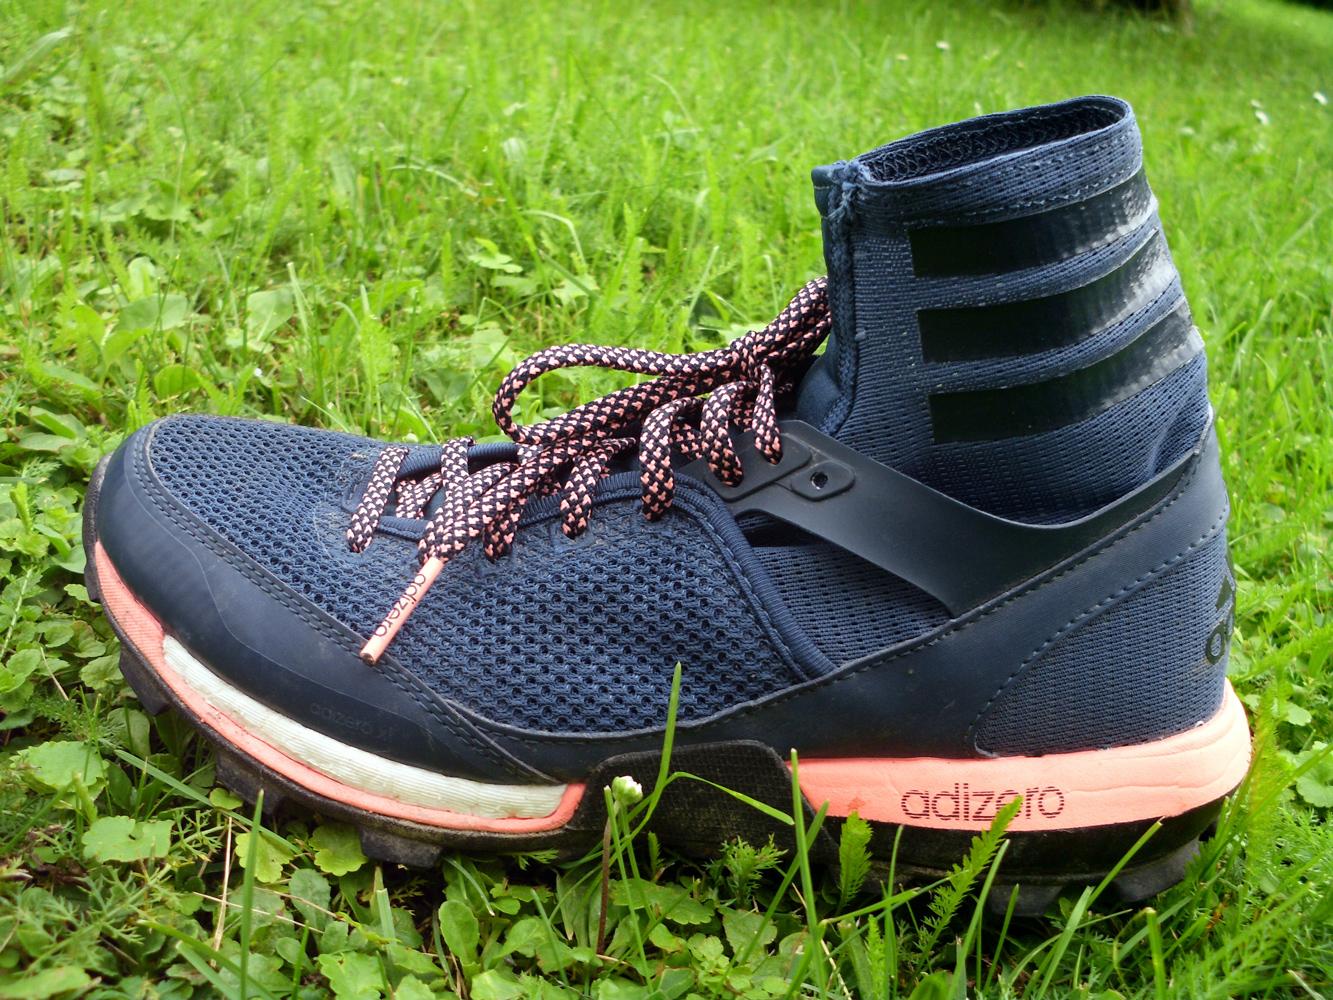 Adidas-Adizero-XtBoost1